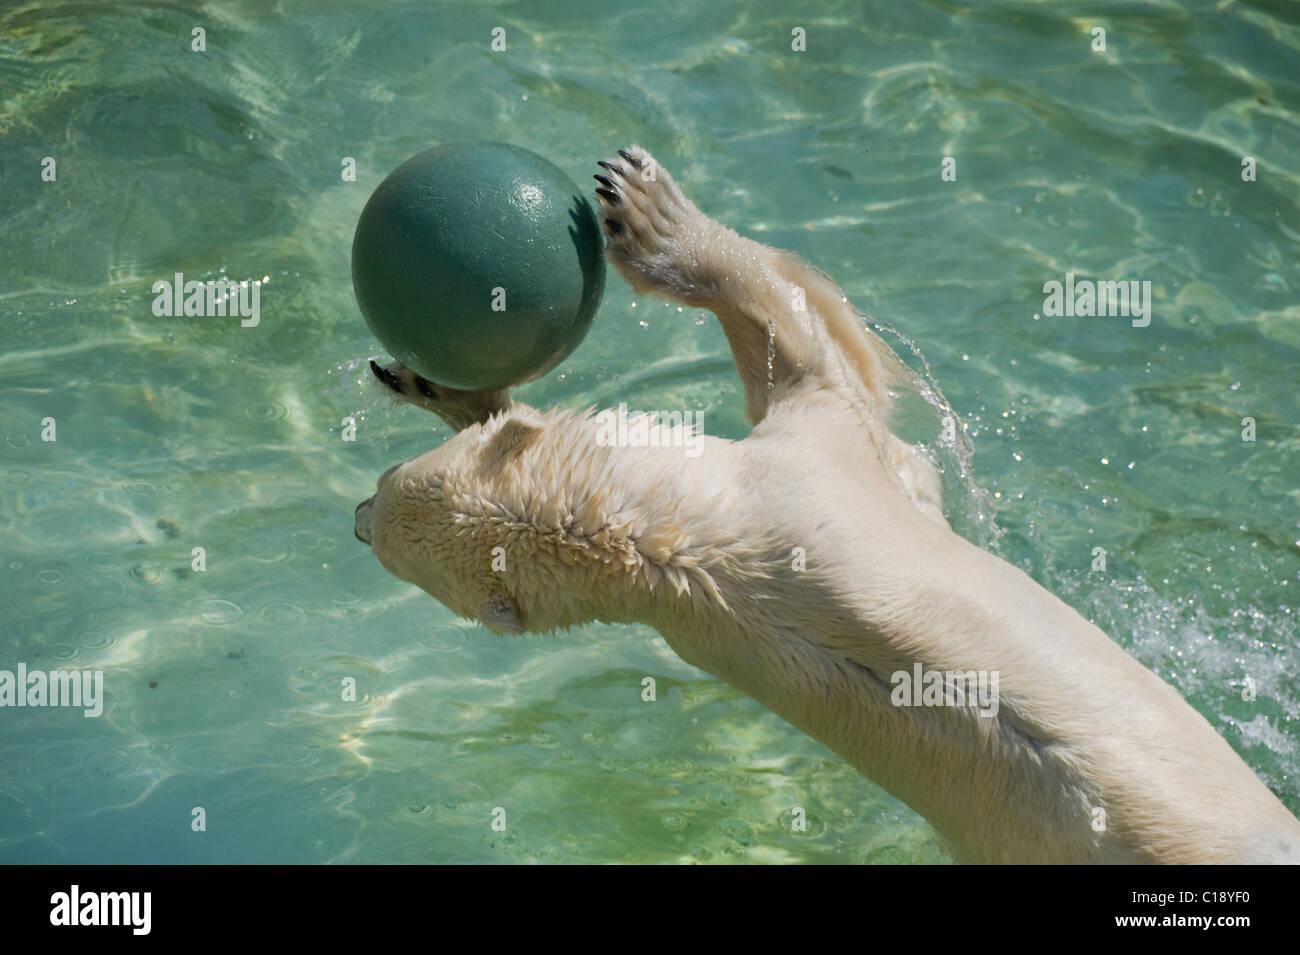 Polar Bear (Ursus maritimus) playing with a ball, Zoo Schoenbrunn, Vienna, Austria, Europe Stock Photo